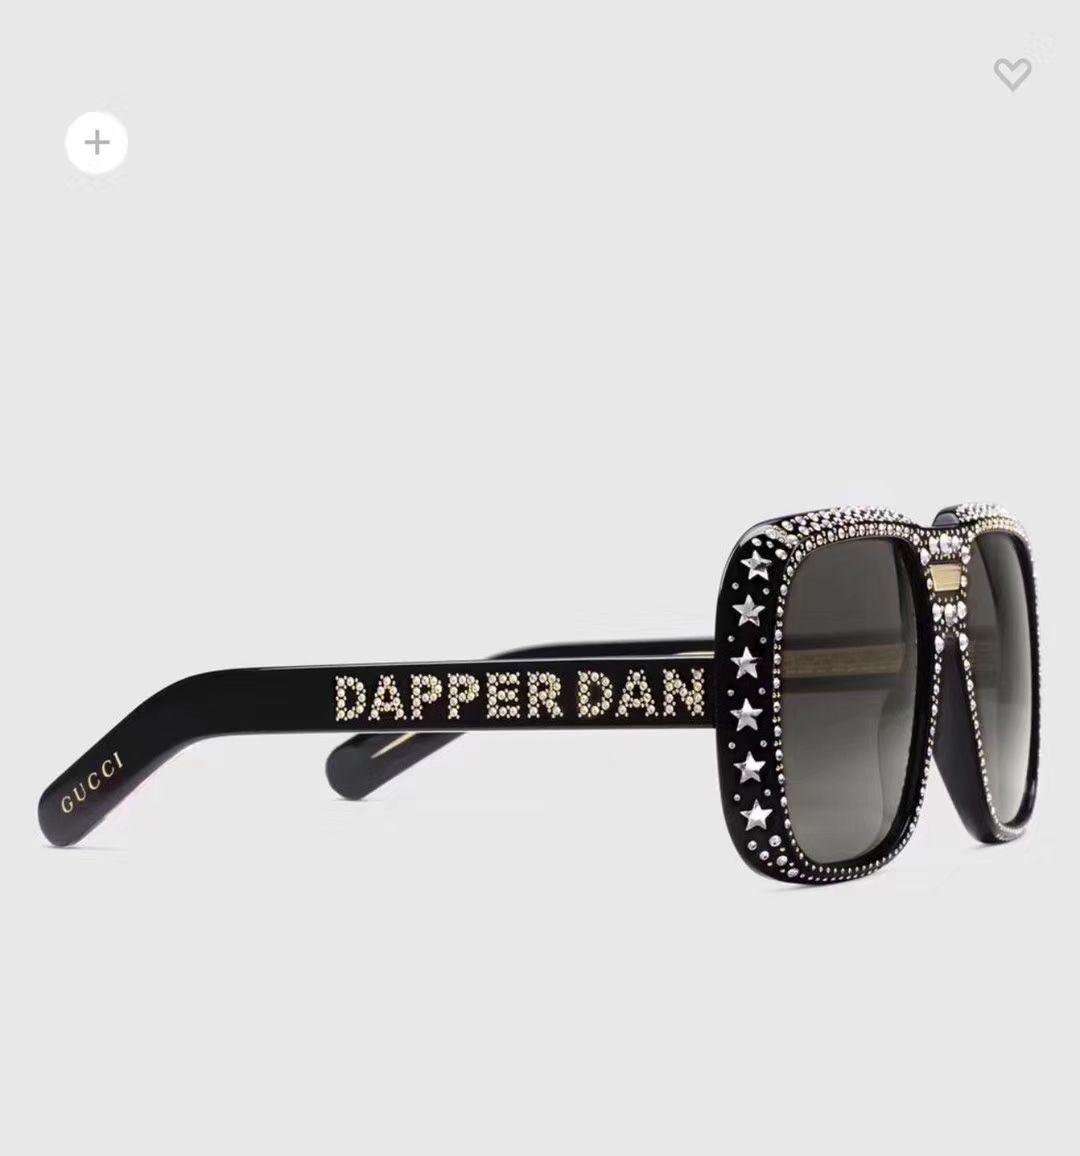 733a952c376 New Arrivals 2019 Fashion Classic Brand Sunglasses Men S HD Polarized  Aluminum Driving Luxury Design Sun Glasses For Men UV400 Oculos John Lennon  Sunglasses ...